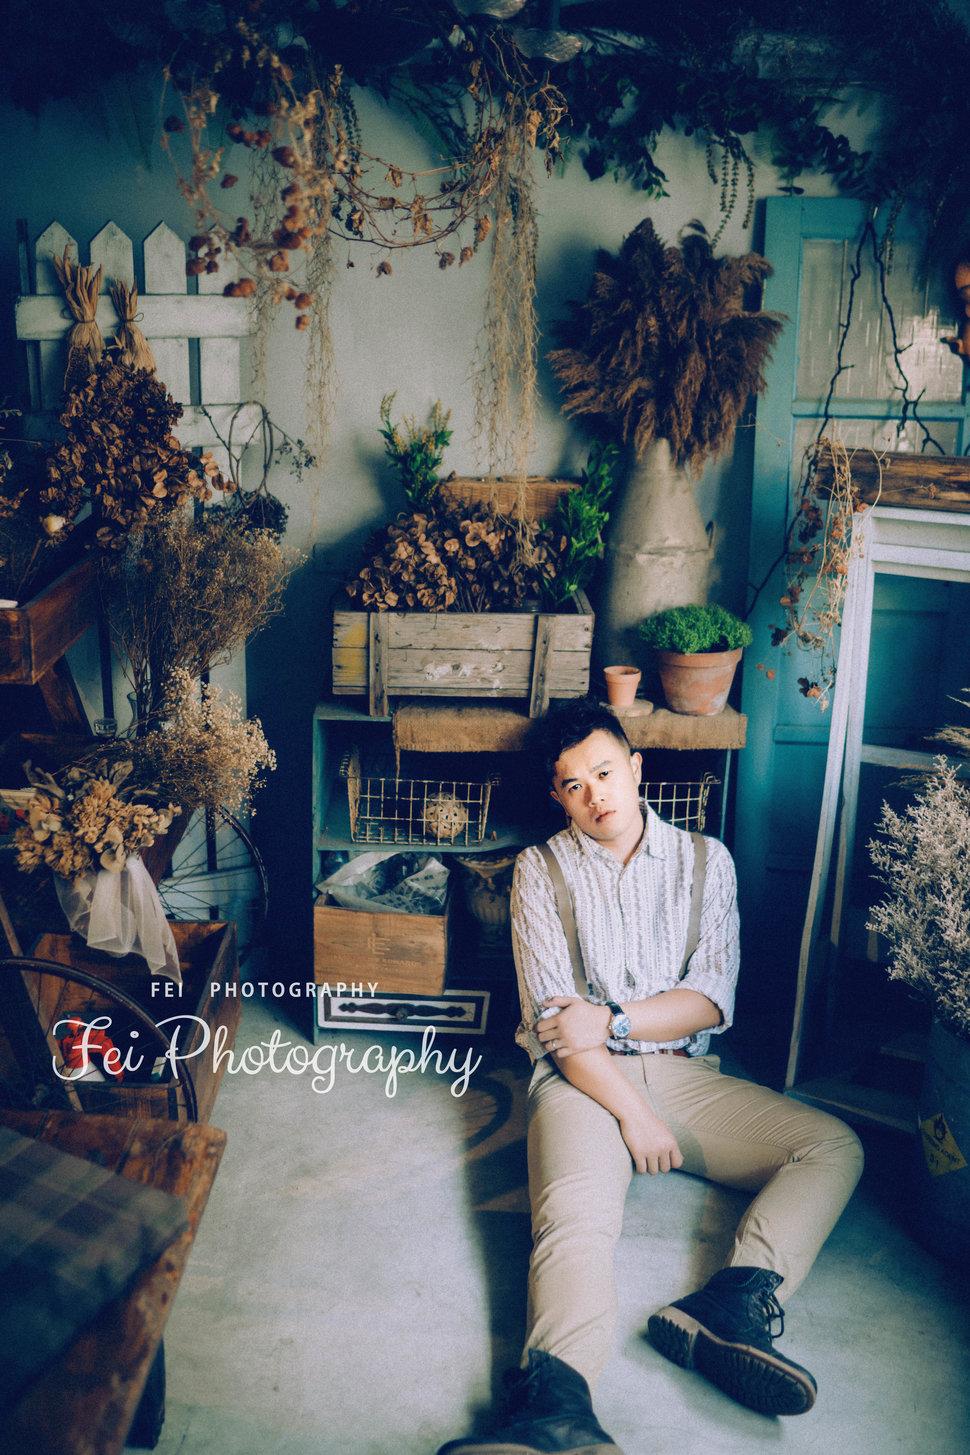 48 - 飛妃 Photography/女攝影師《結婚吧》